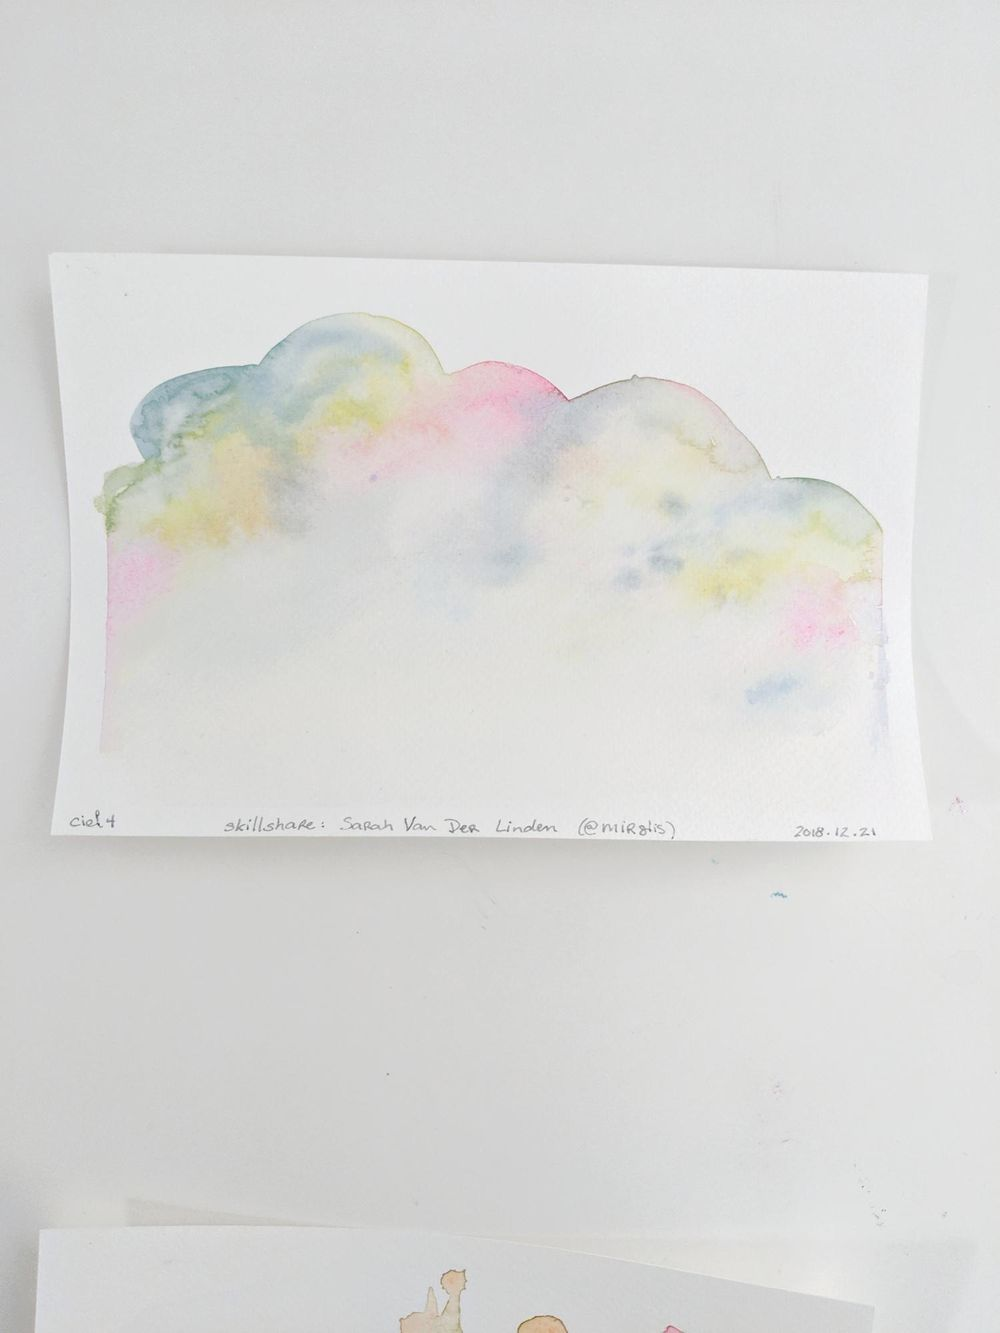 Ciels avec Sarah - image 6 - student project